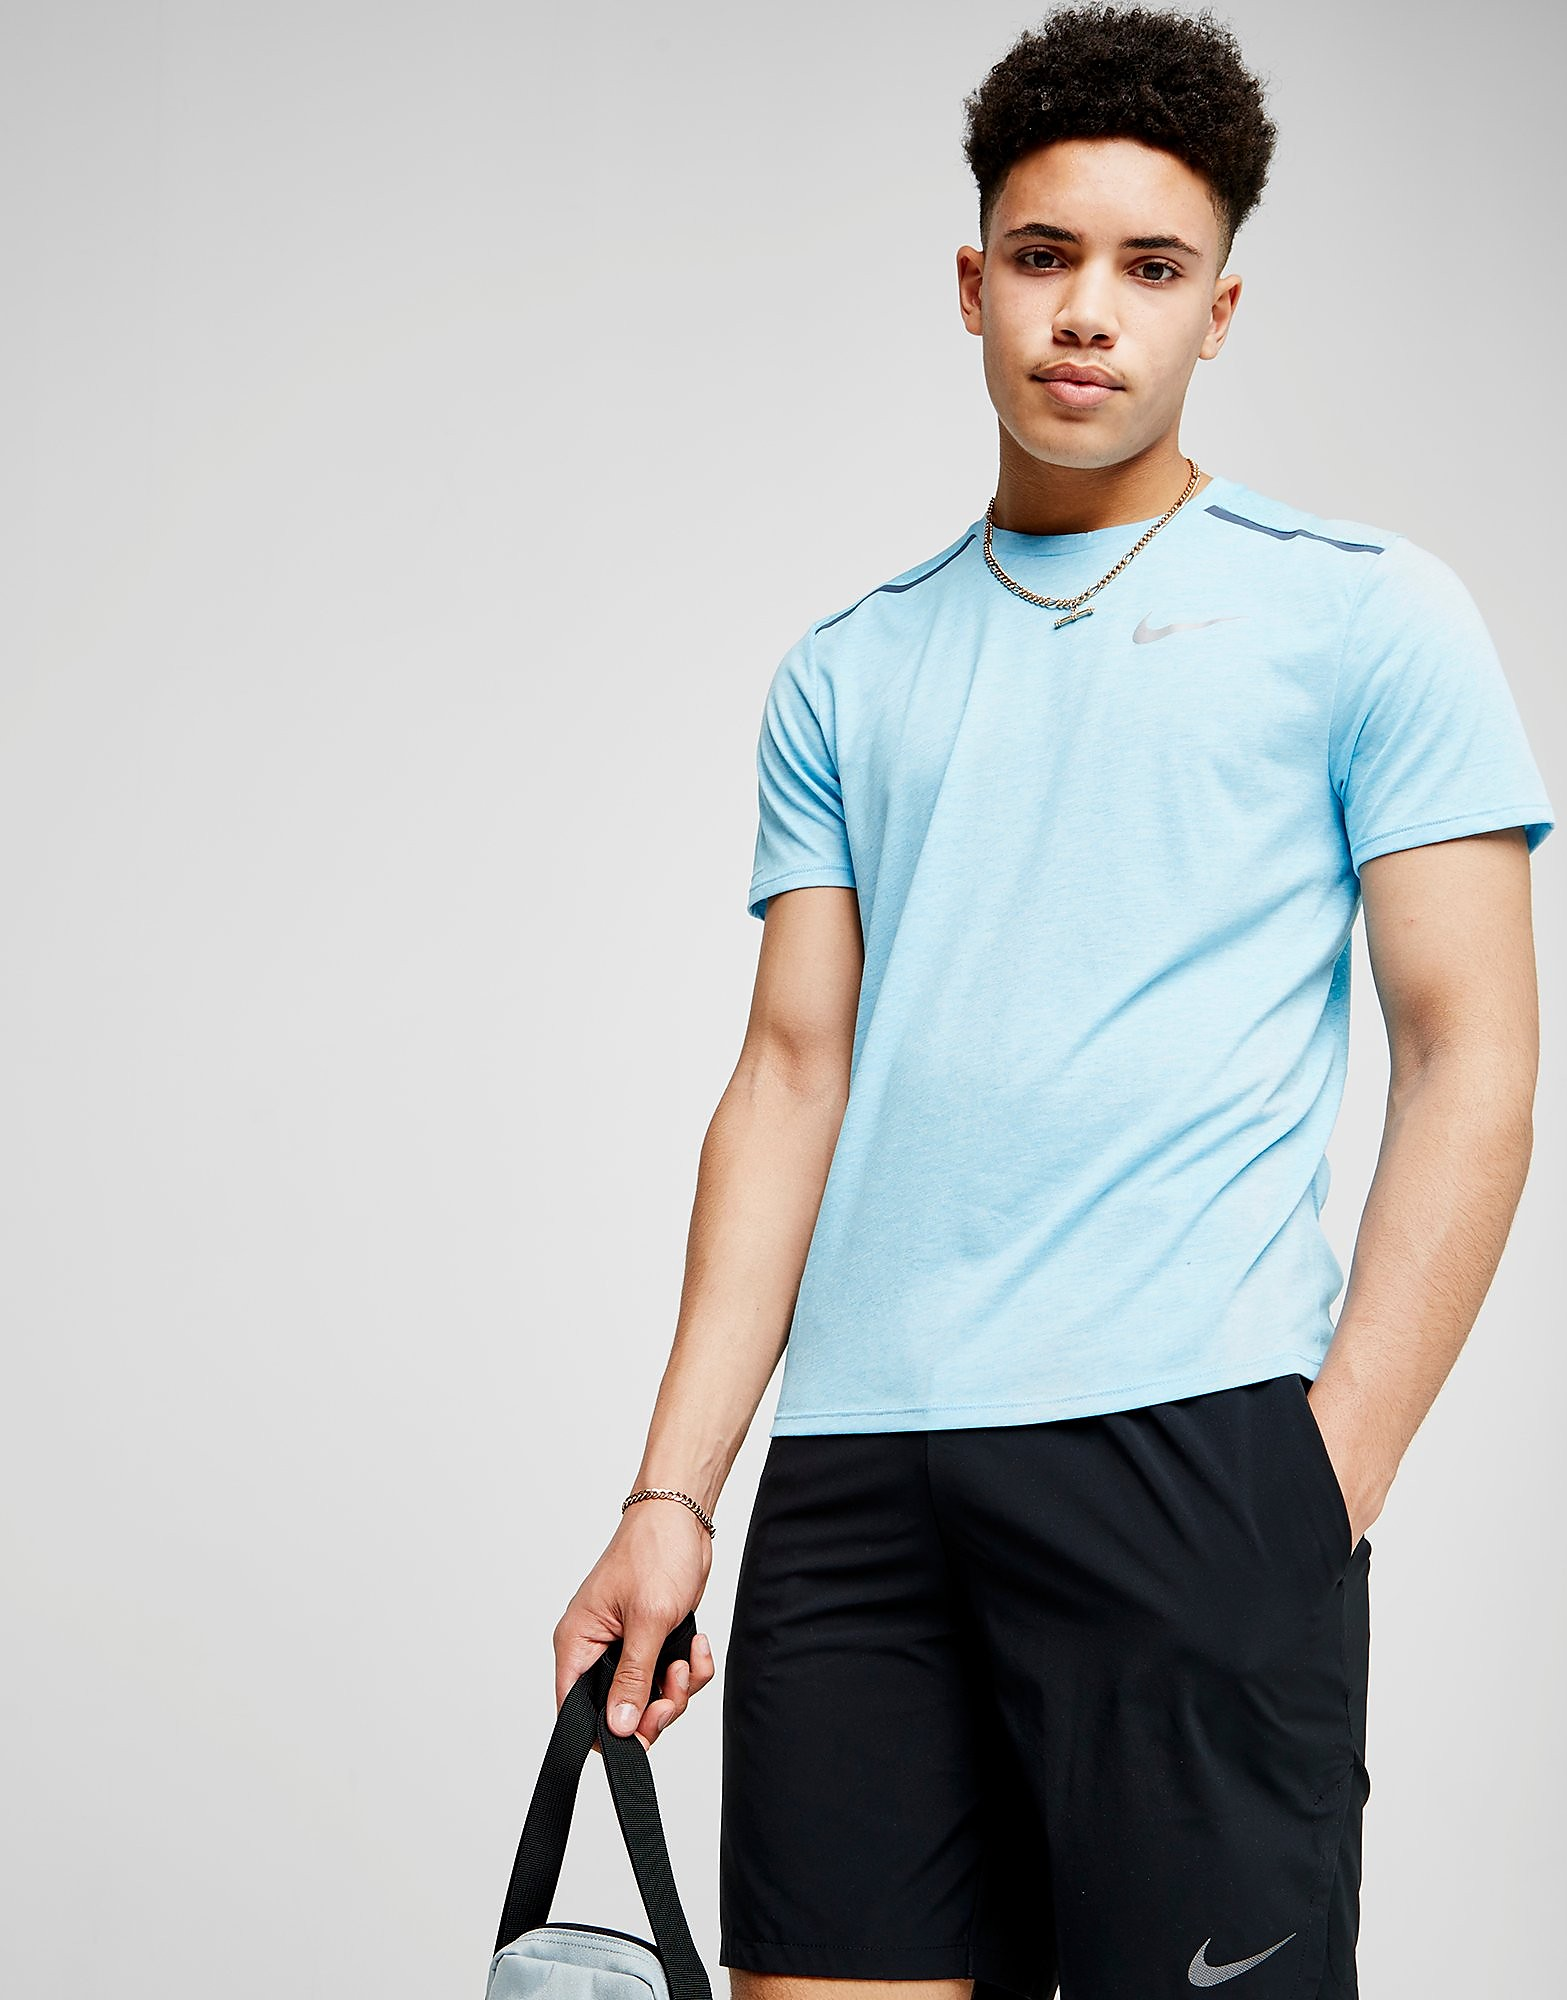 Nike Breathe Rise Short Sleeve T-Shirt Heren - Blauw - Heren